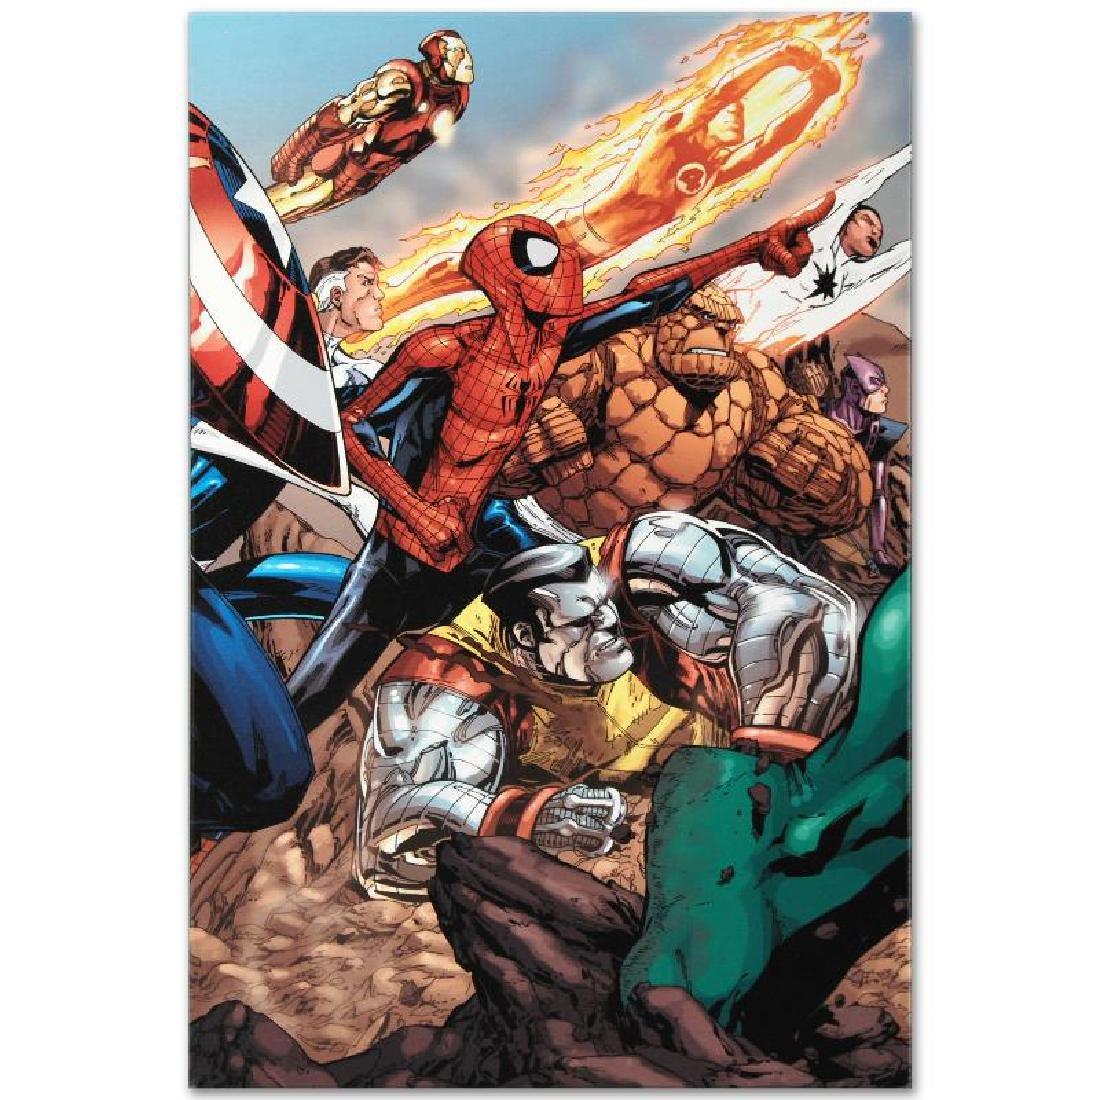 """Spider-Man & The Secret Wars #3"" Limited Edition - 6"